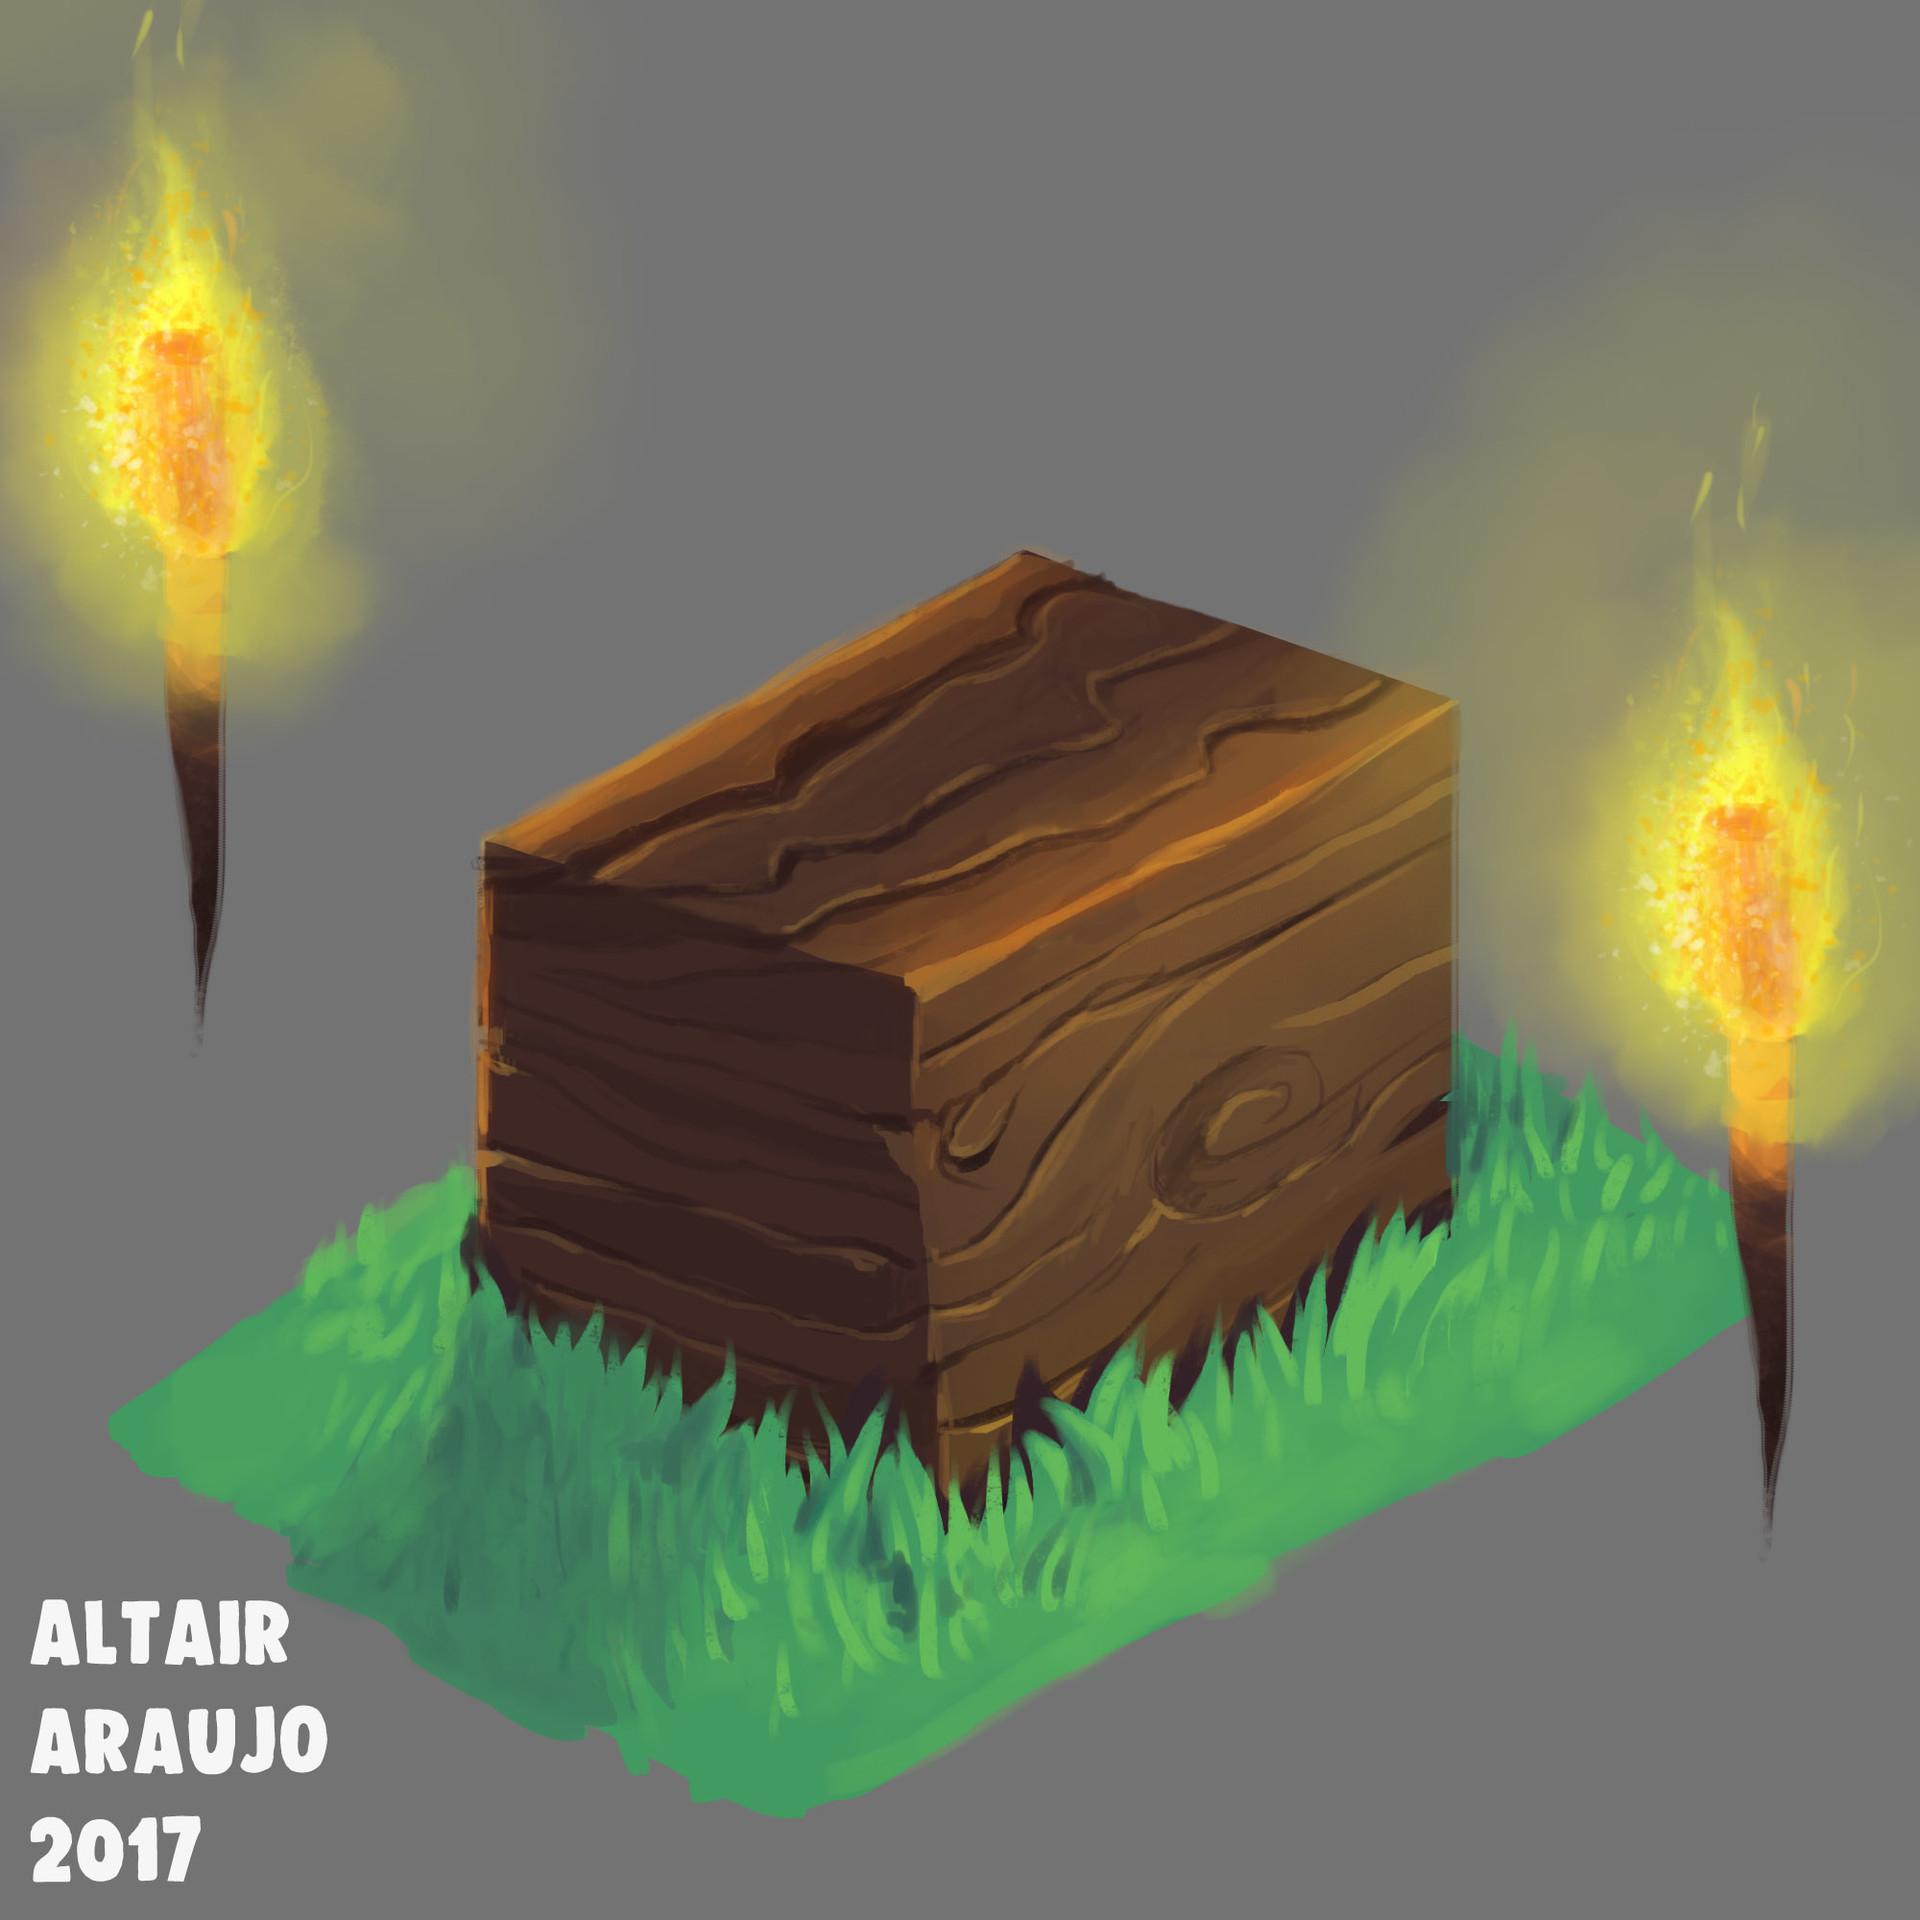 Altair araujo wood